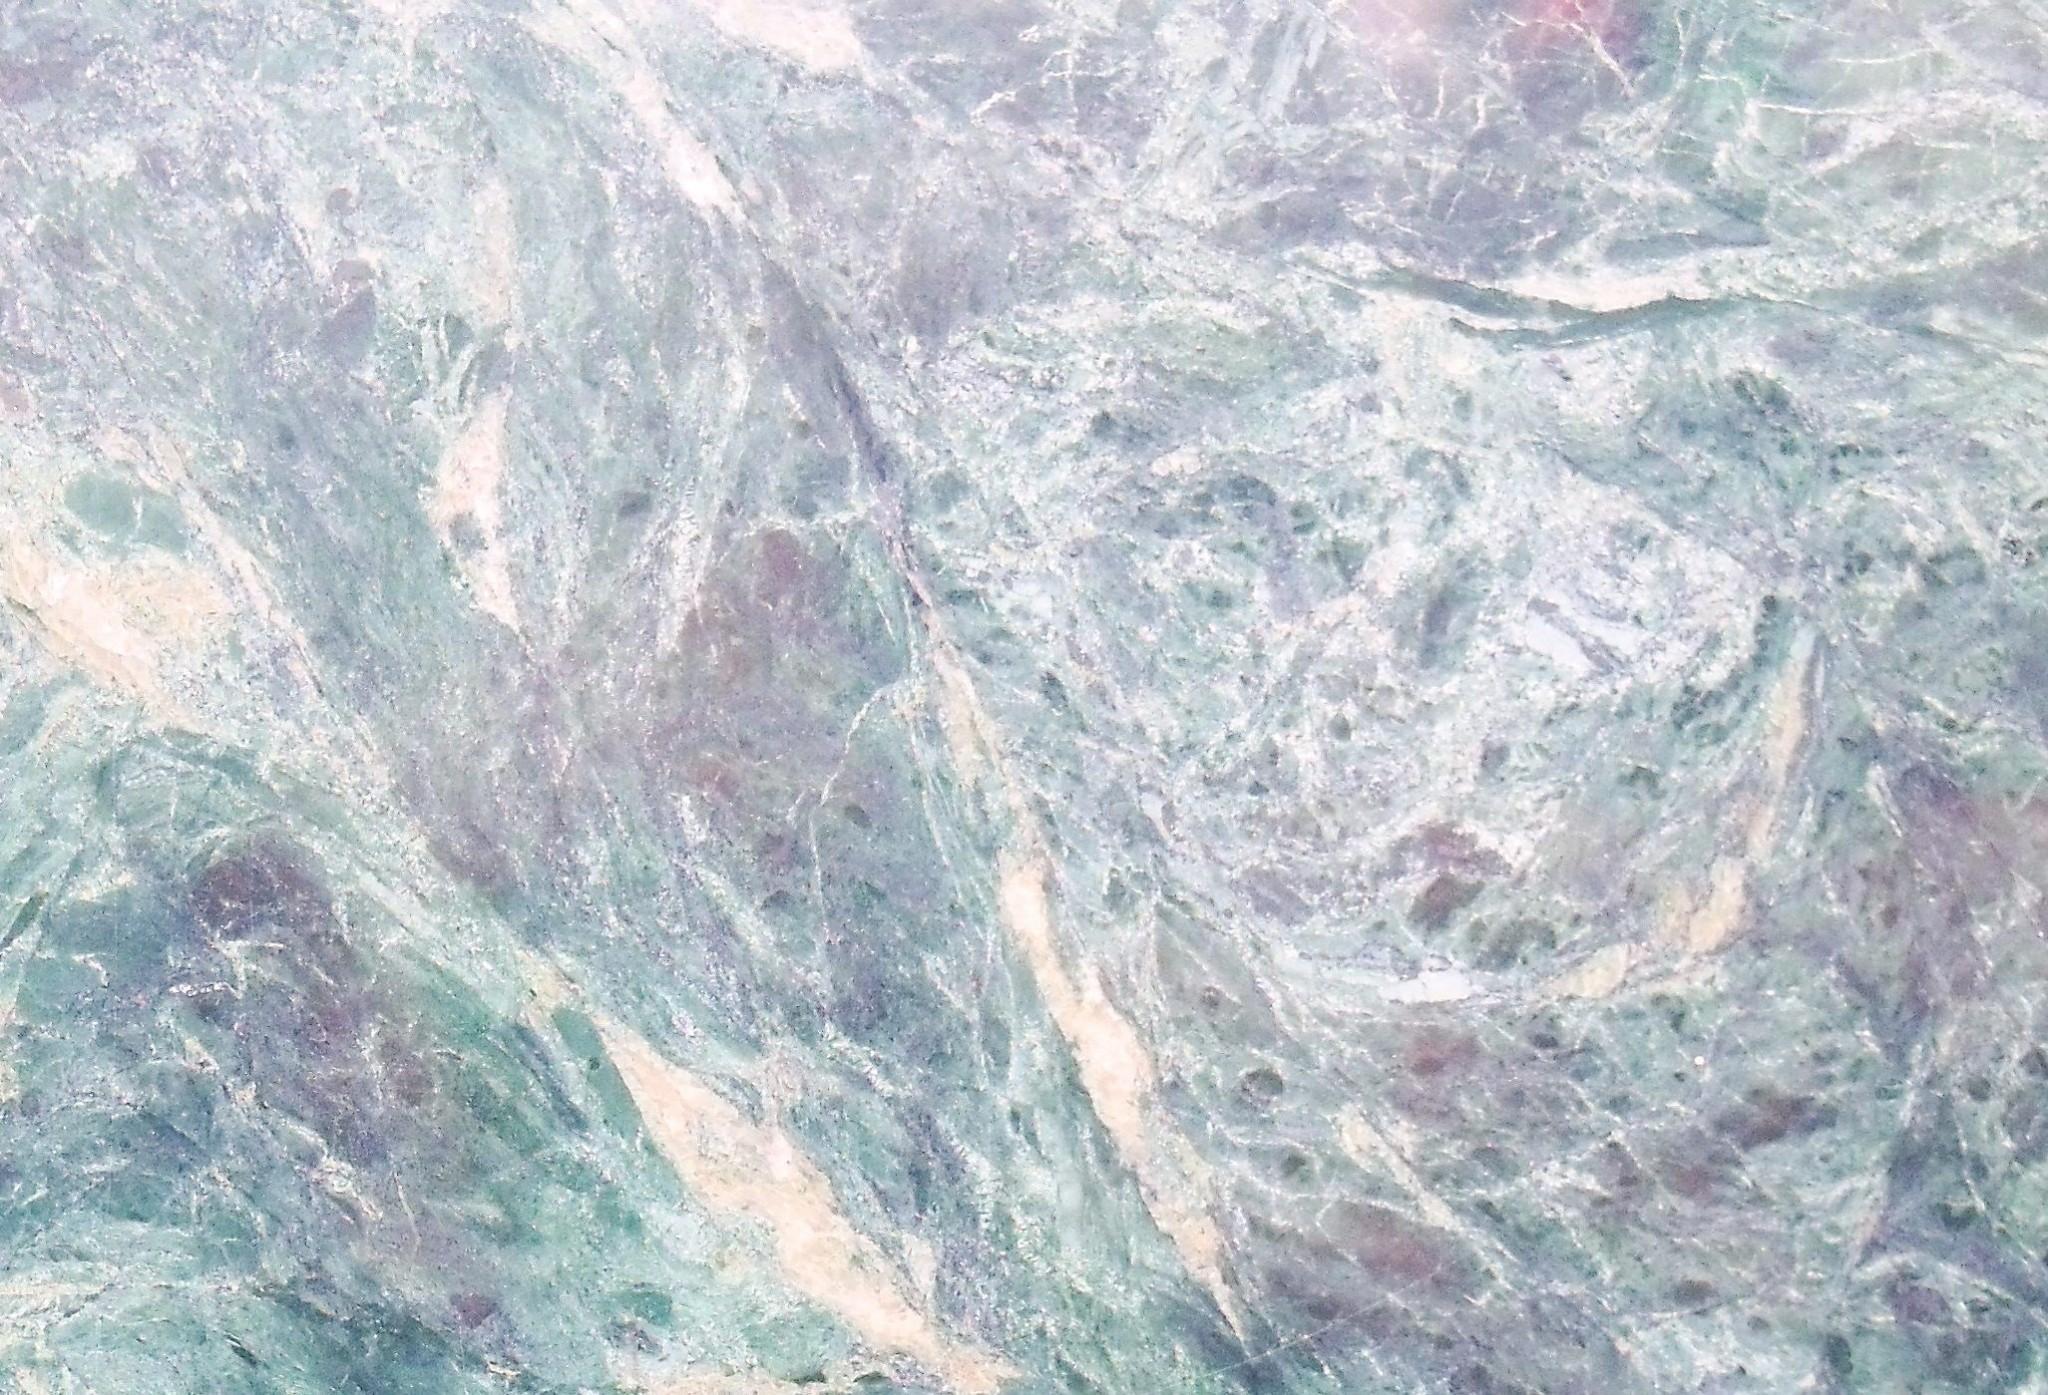 Marble Desktop Wallpaper High Resolution Gray Marble Background 2048x1395 Wallpaper Teahub Io